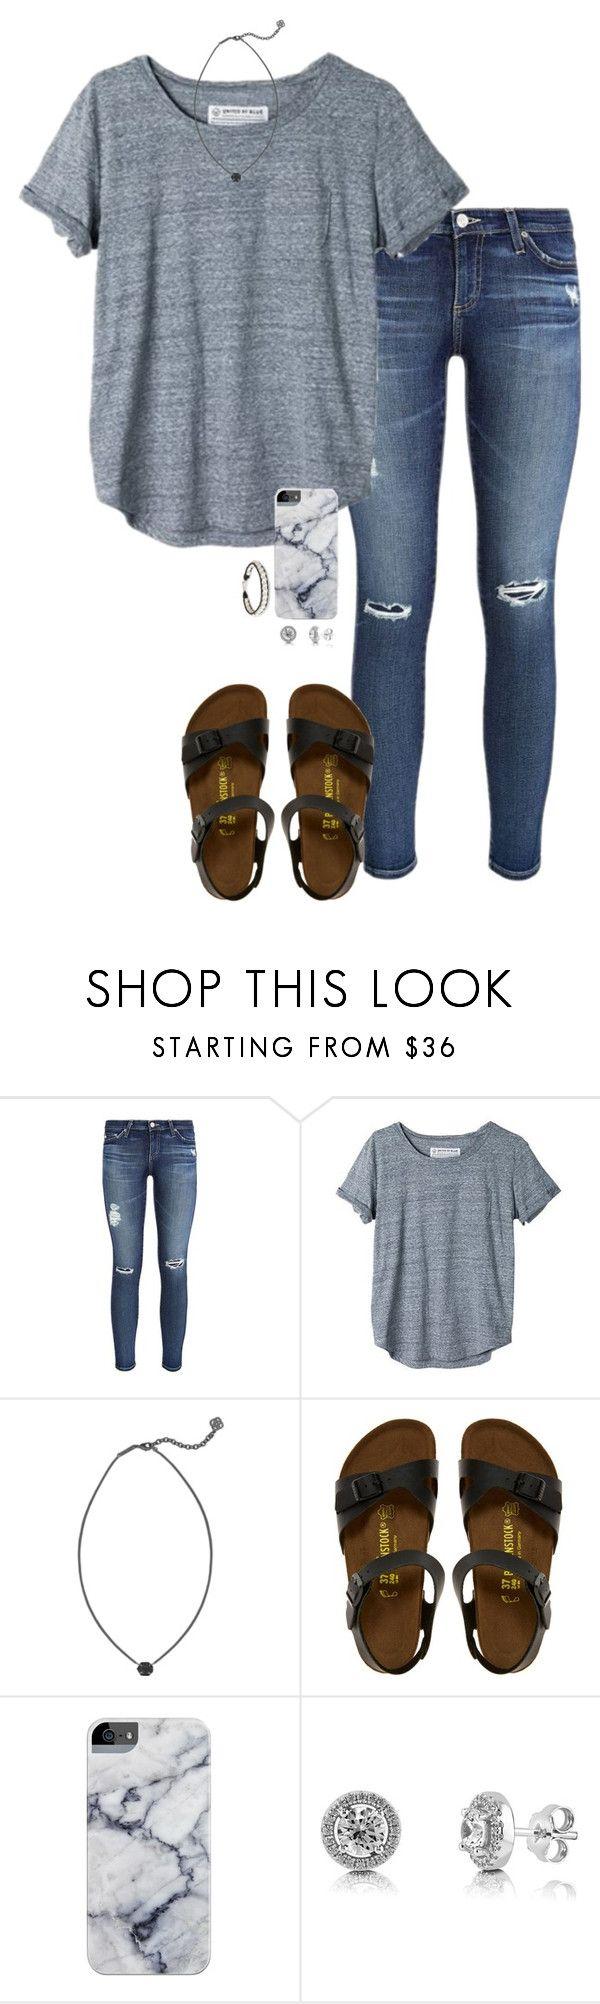 T Shirt Jeansbroek Sandalen Armband Ketting Cute Outfits